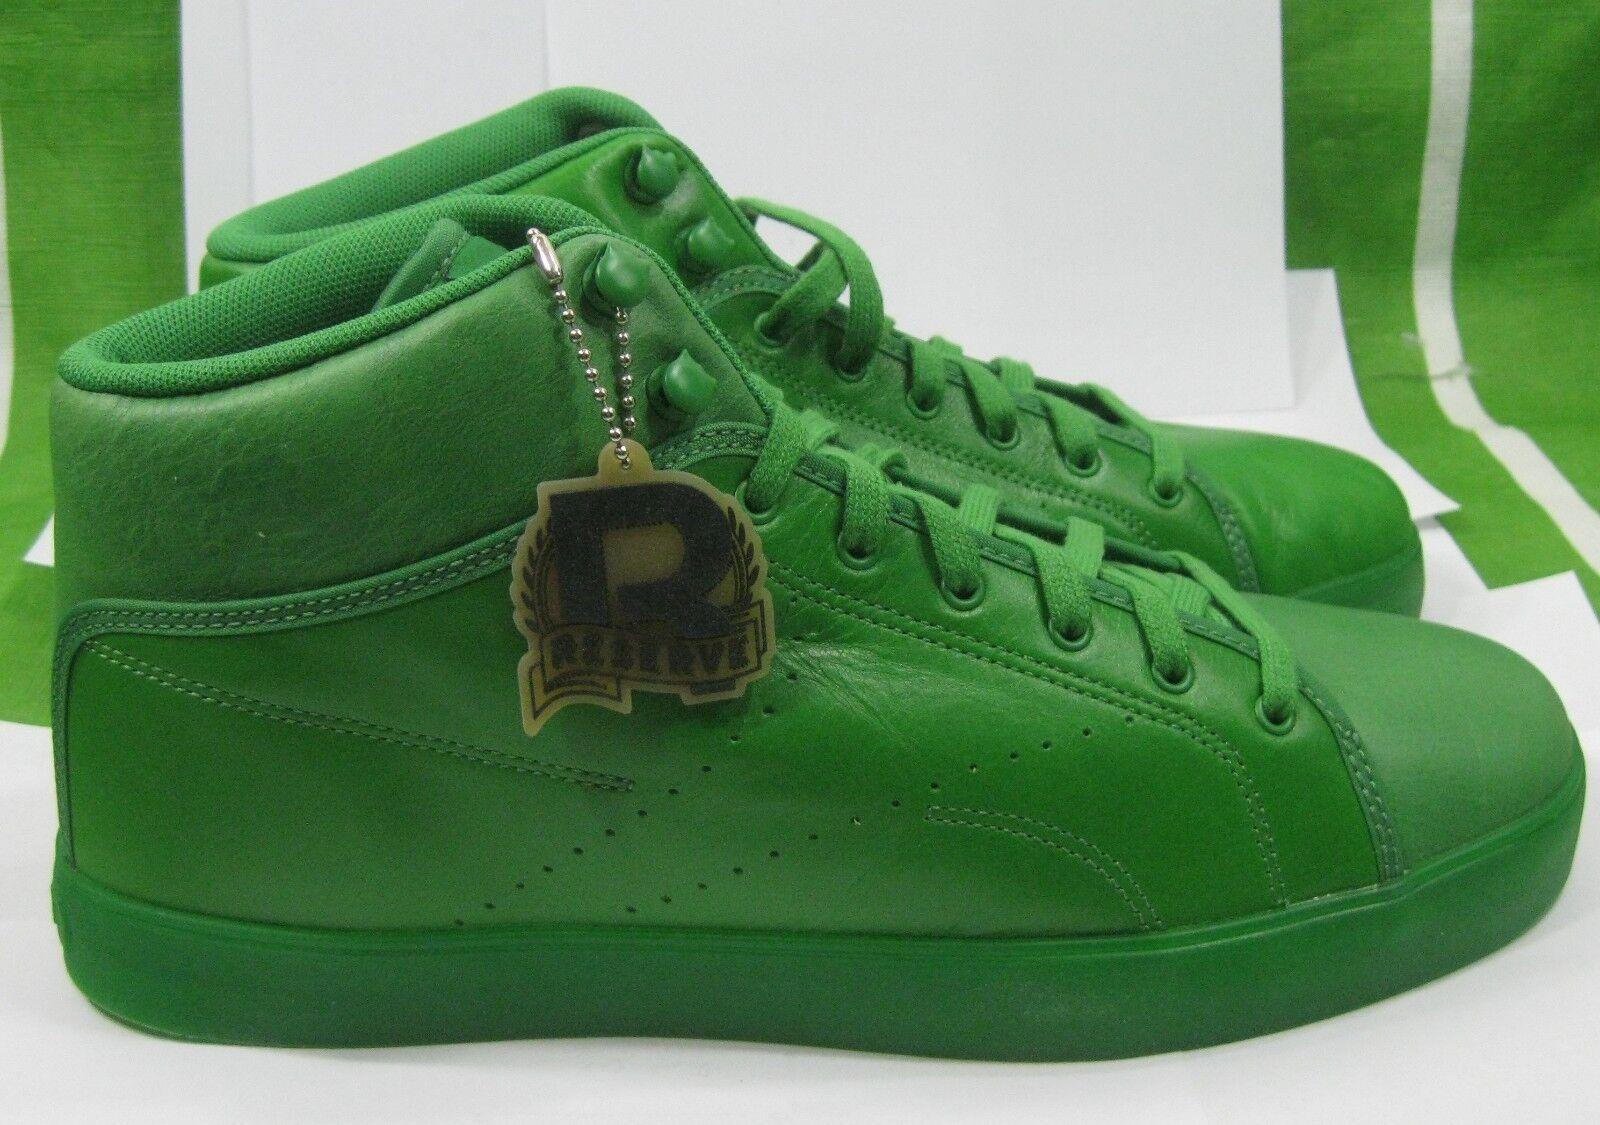 new Reebok Mens Casual Fashion Sneakers  J97765 GRAVITY GREEN  Size 9-9.5